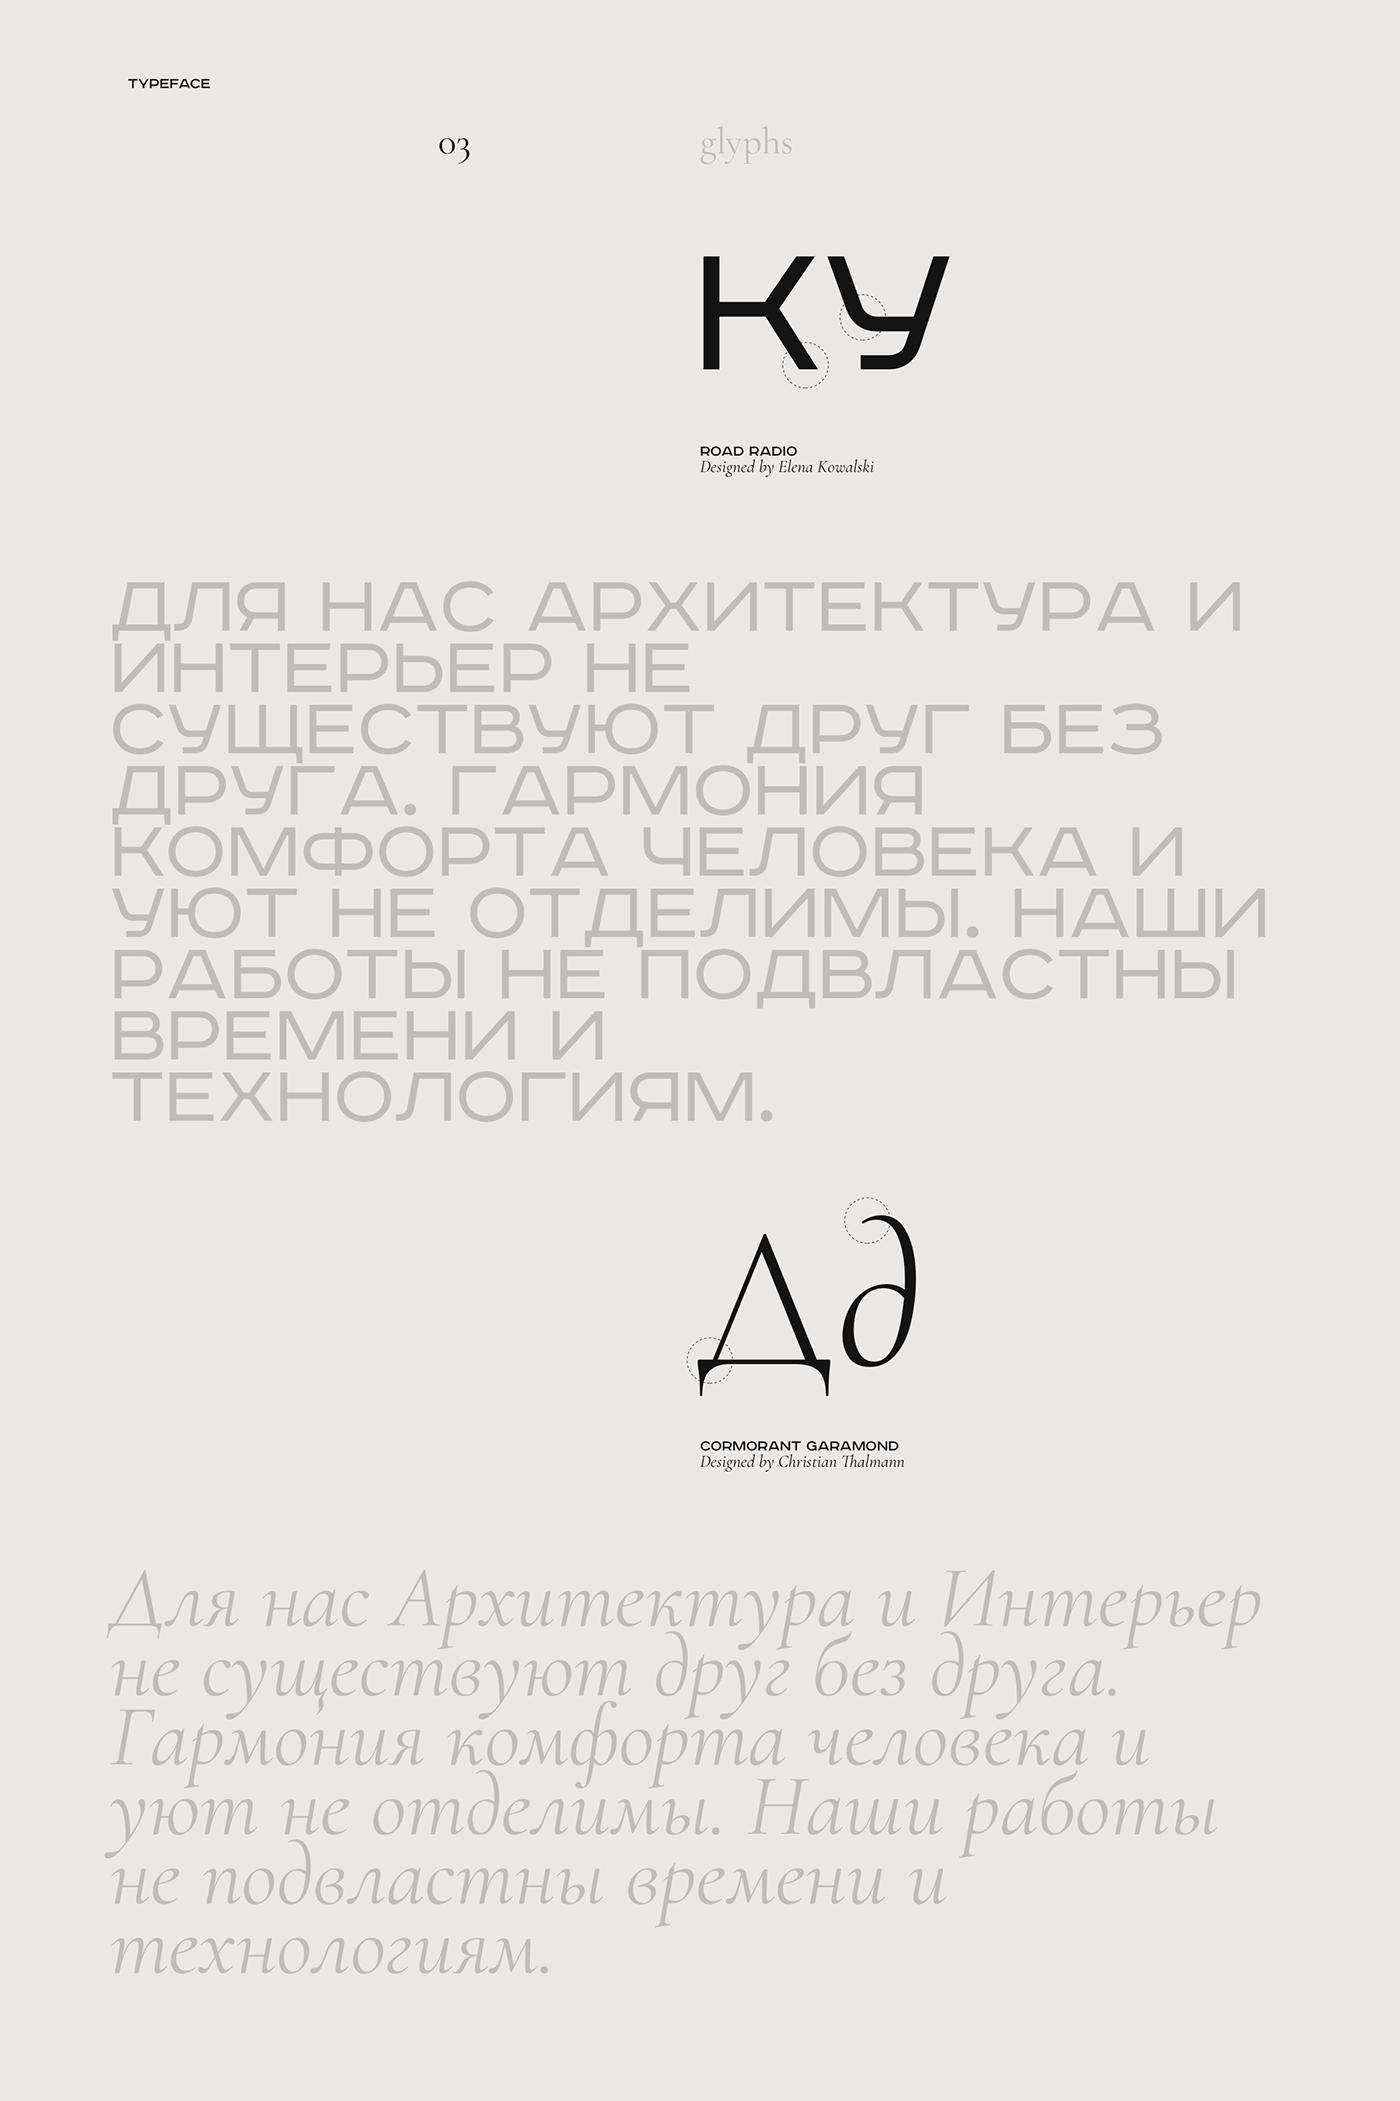 UI,ux,Web,Webdesign,design,architecture,Website,Interface,mobile,user experience